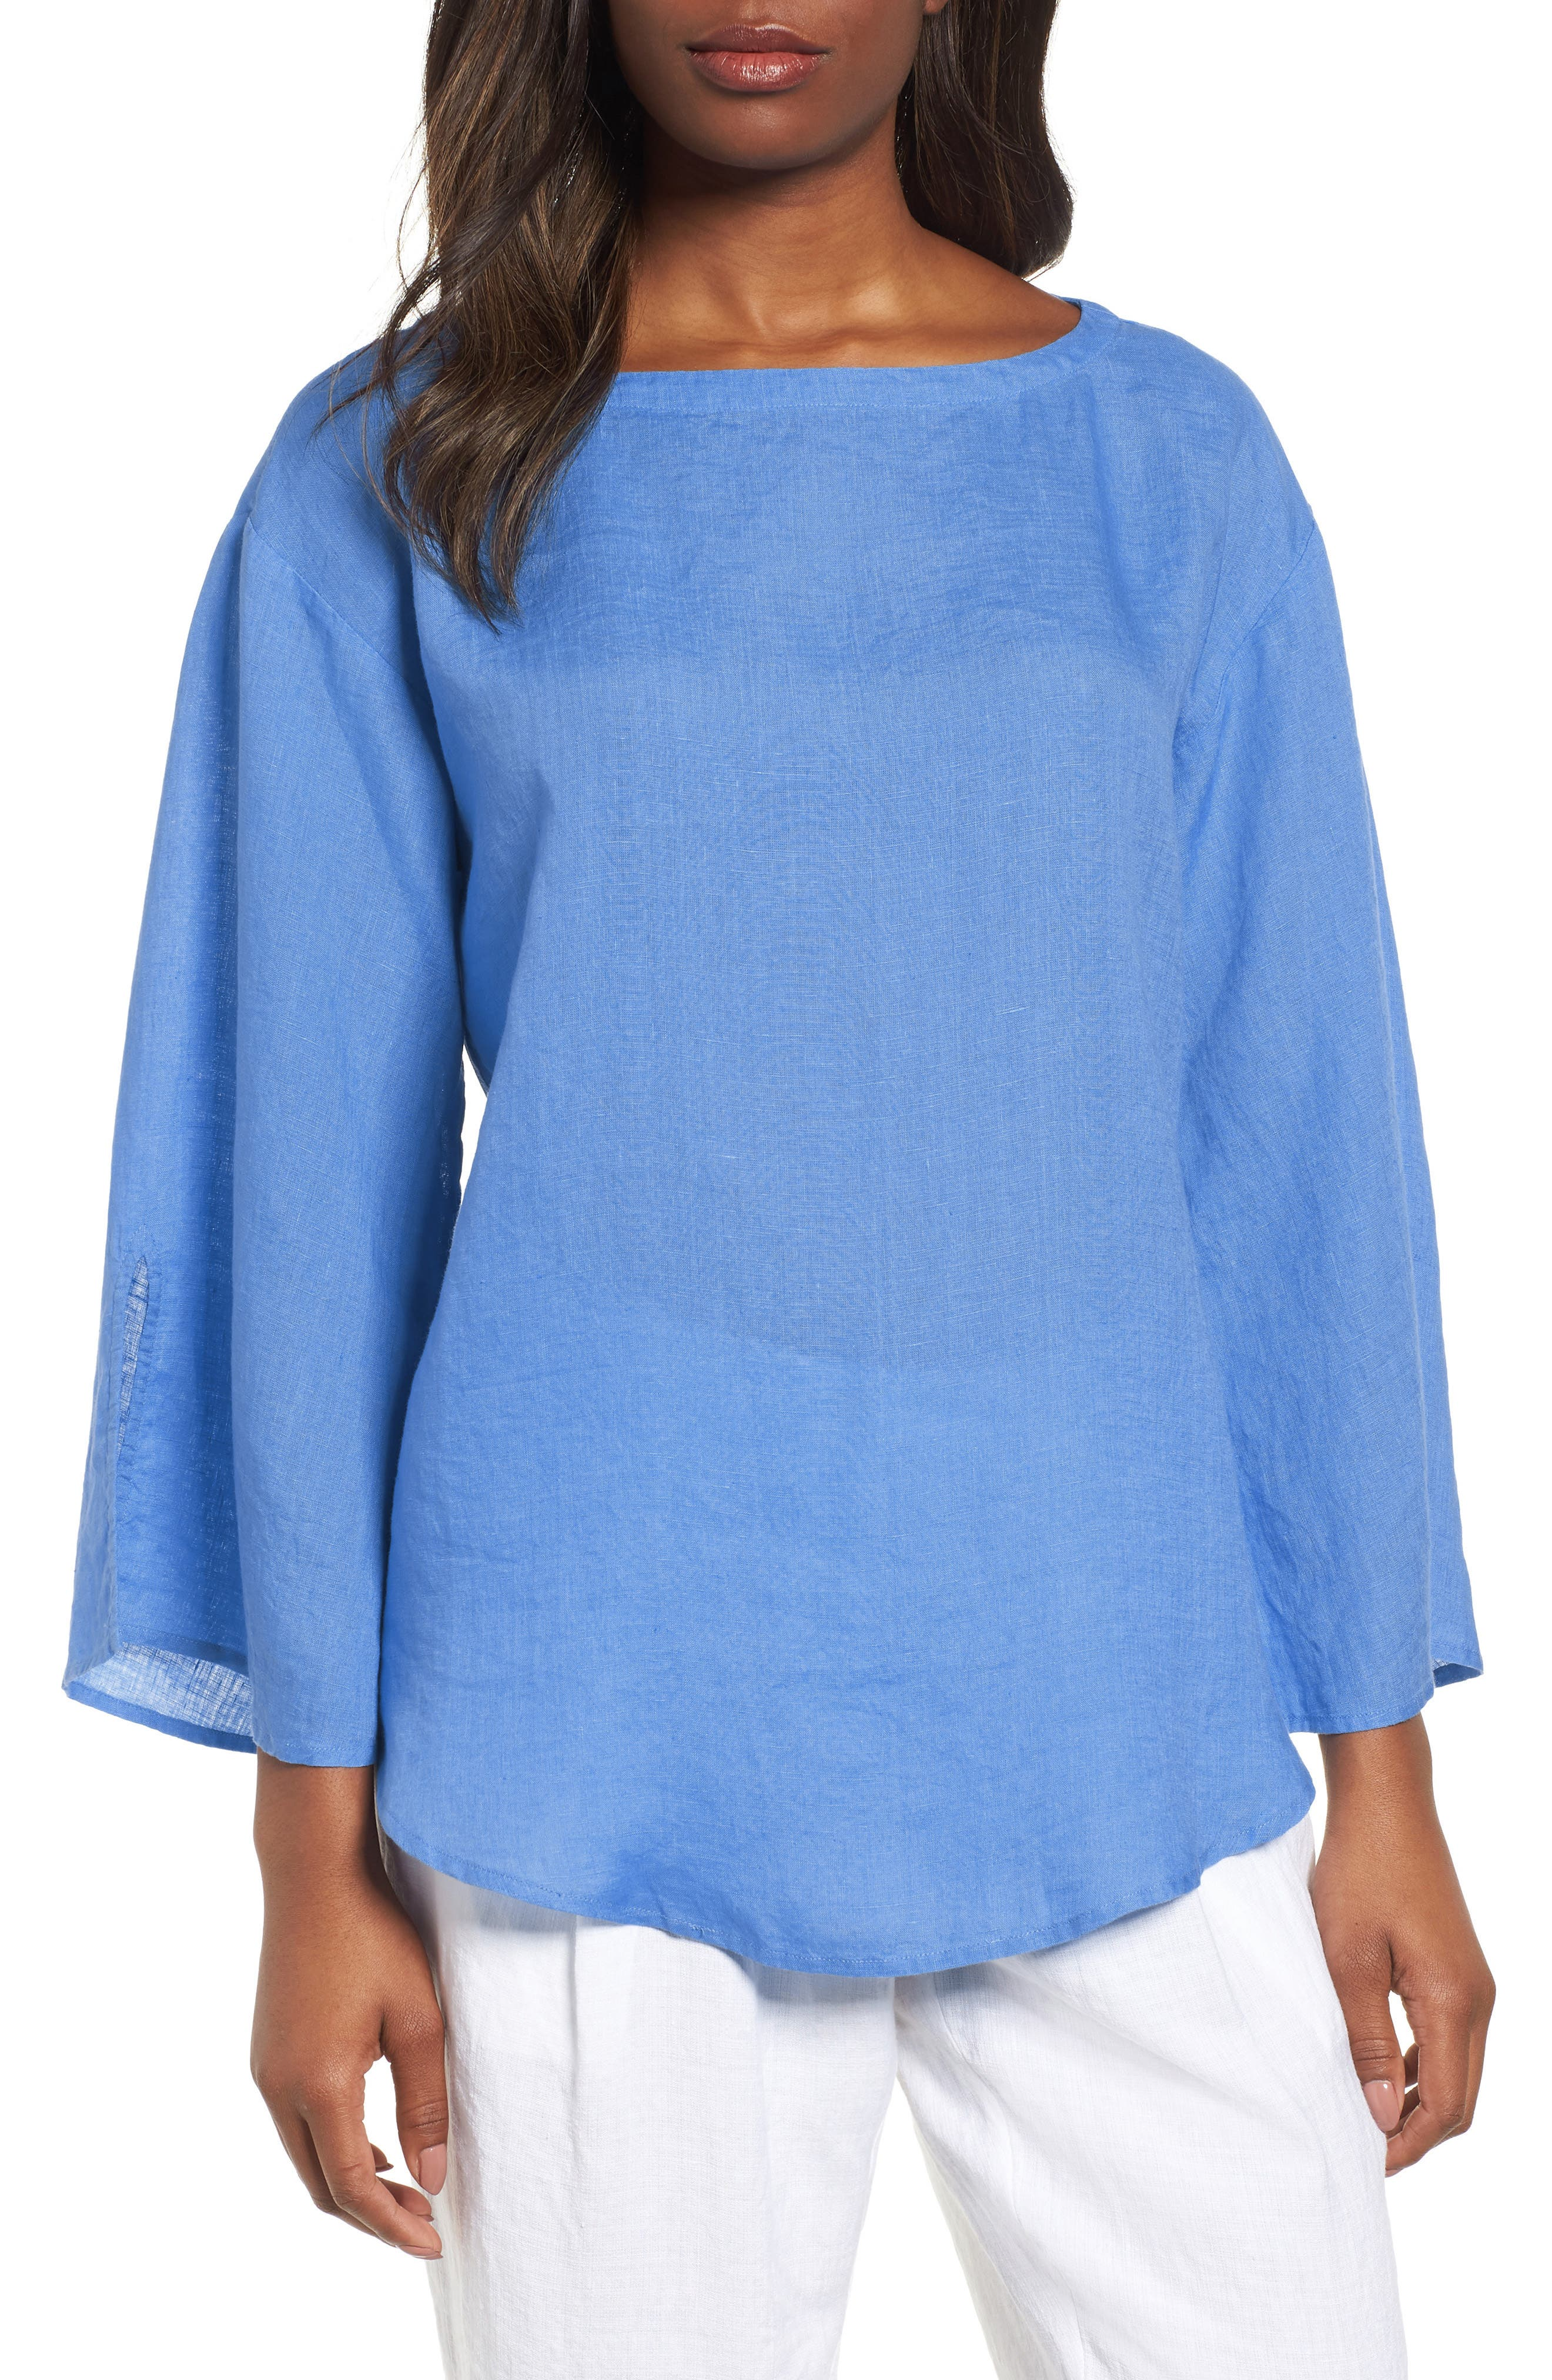 Woven Organic Linen Top,                             Main thumbnail 1, color,                             Bluebell